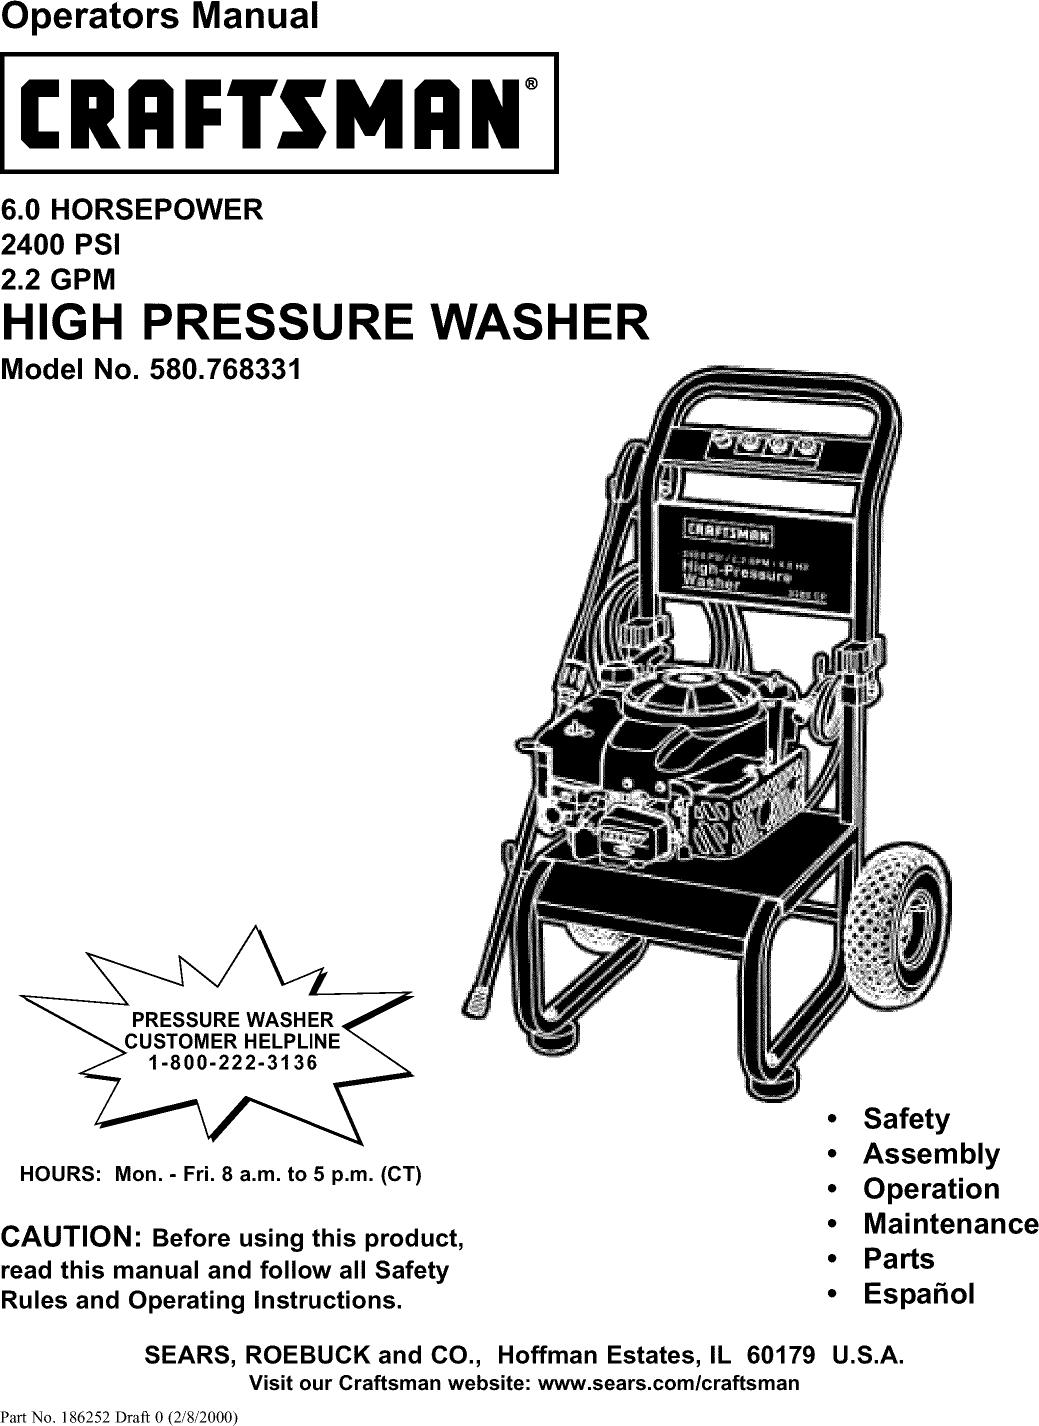 Craftsman 580768331 User Manual PRESSURE WASHER Manuals